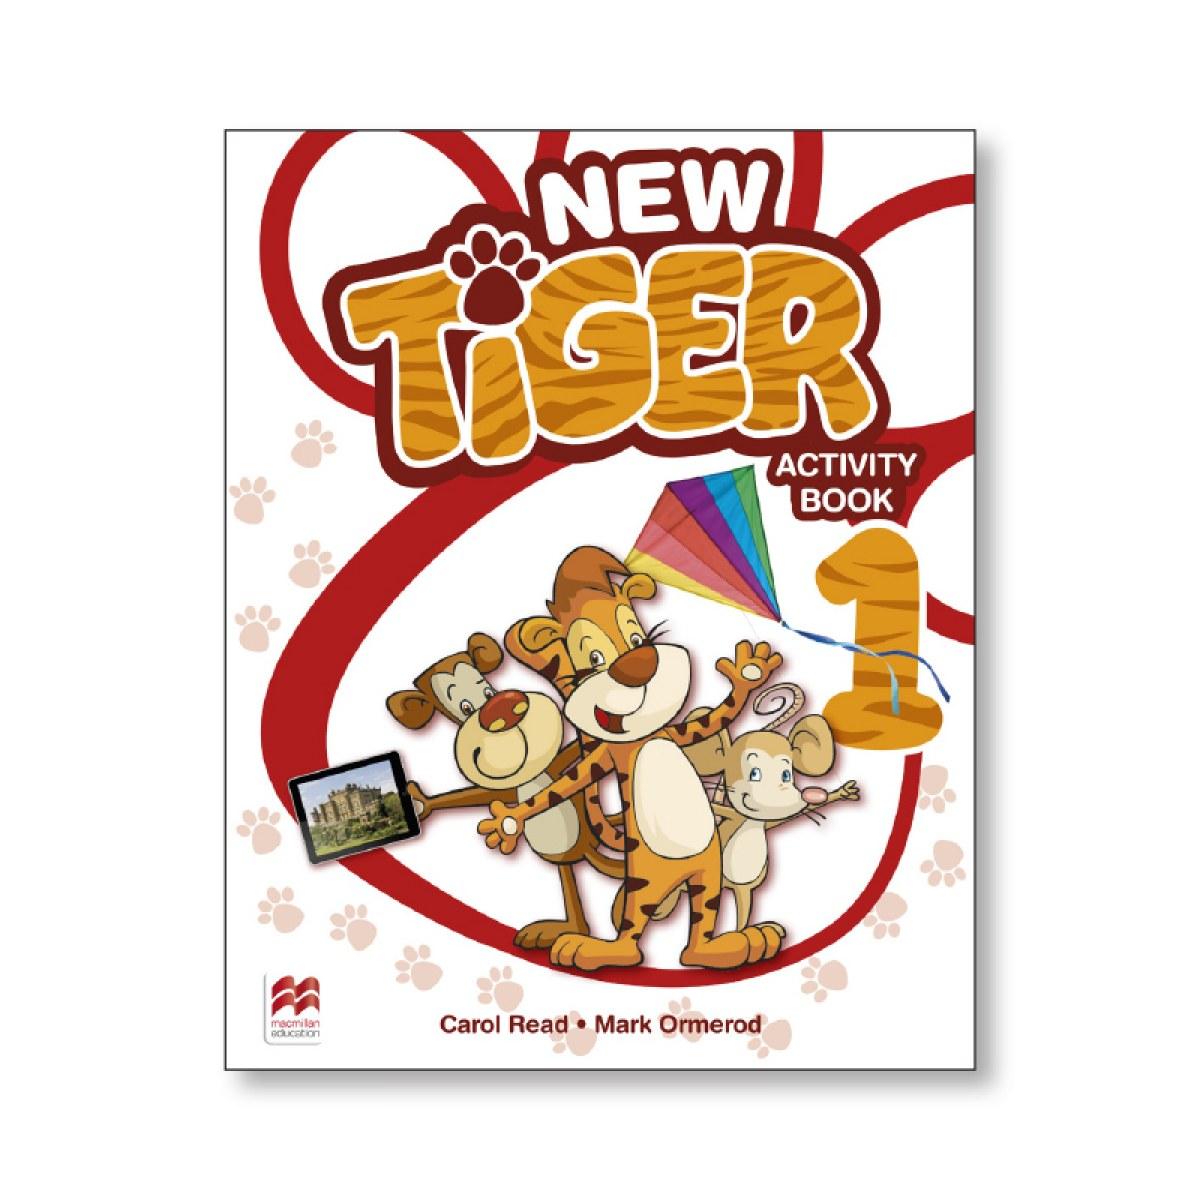 NEW TIGER 1 ACTIVITY BOOK 9781380008886